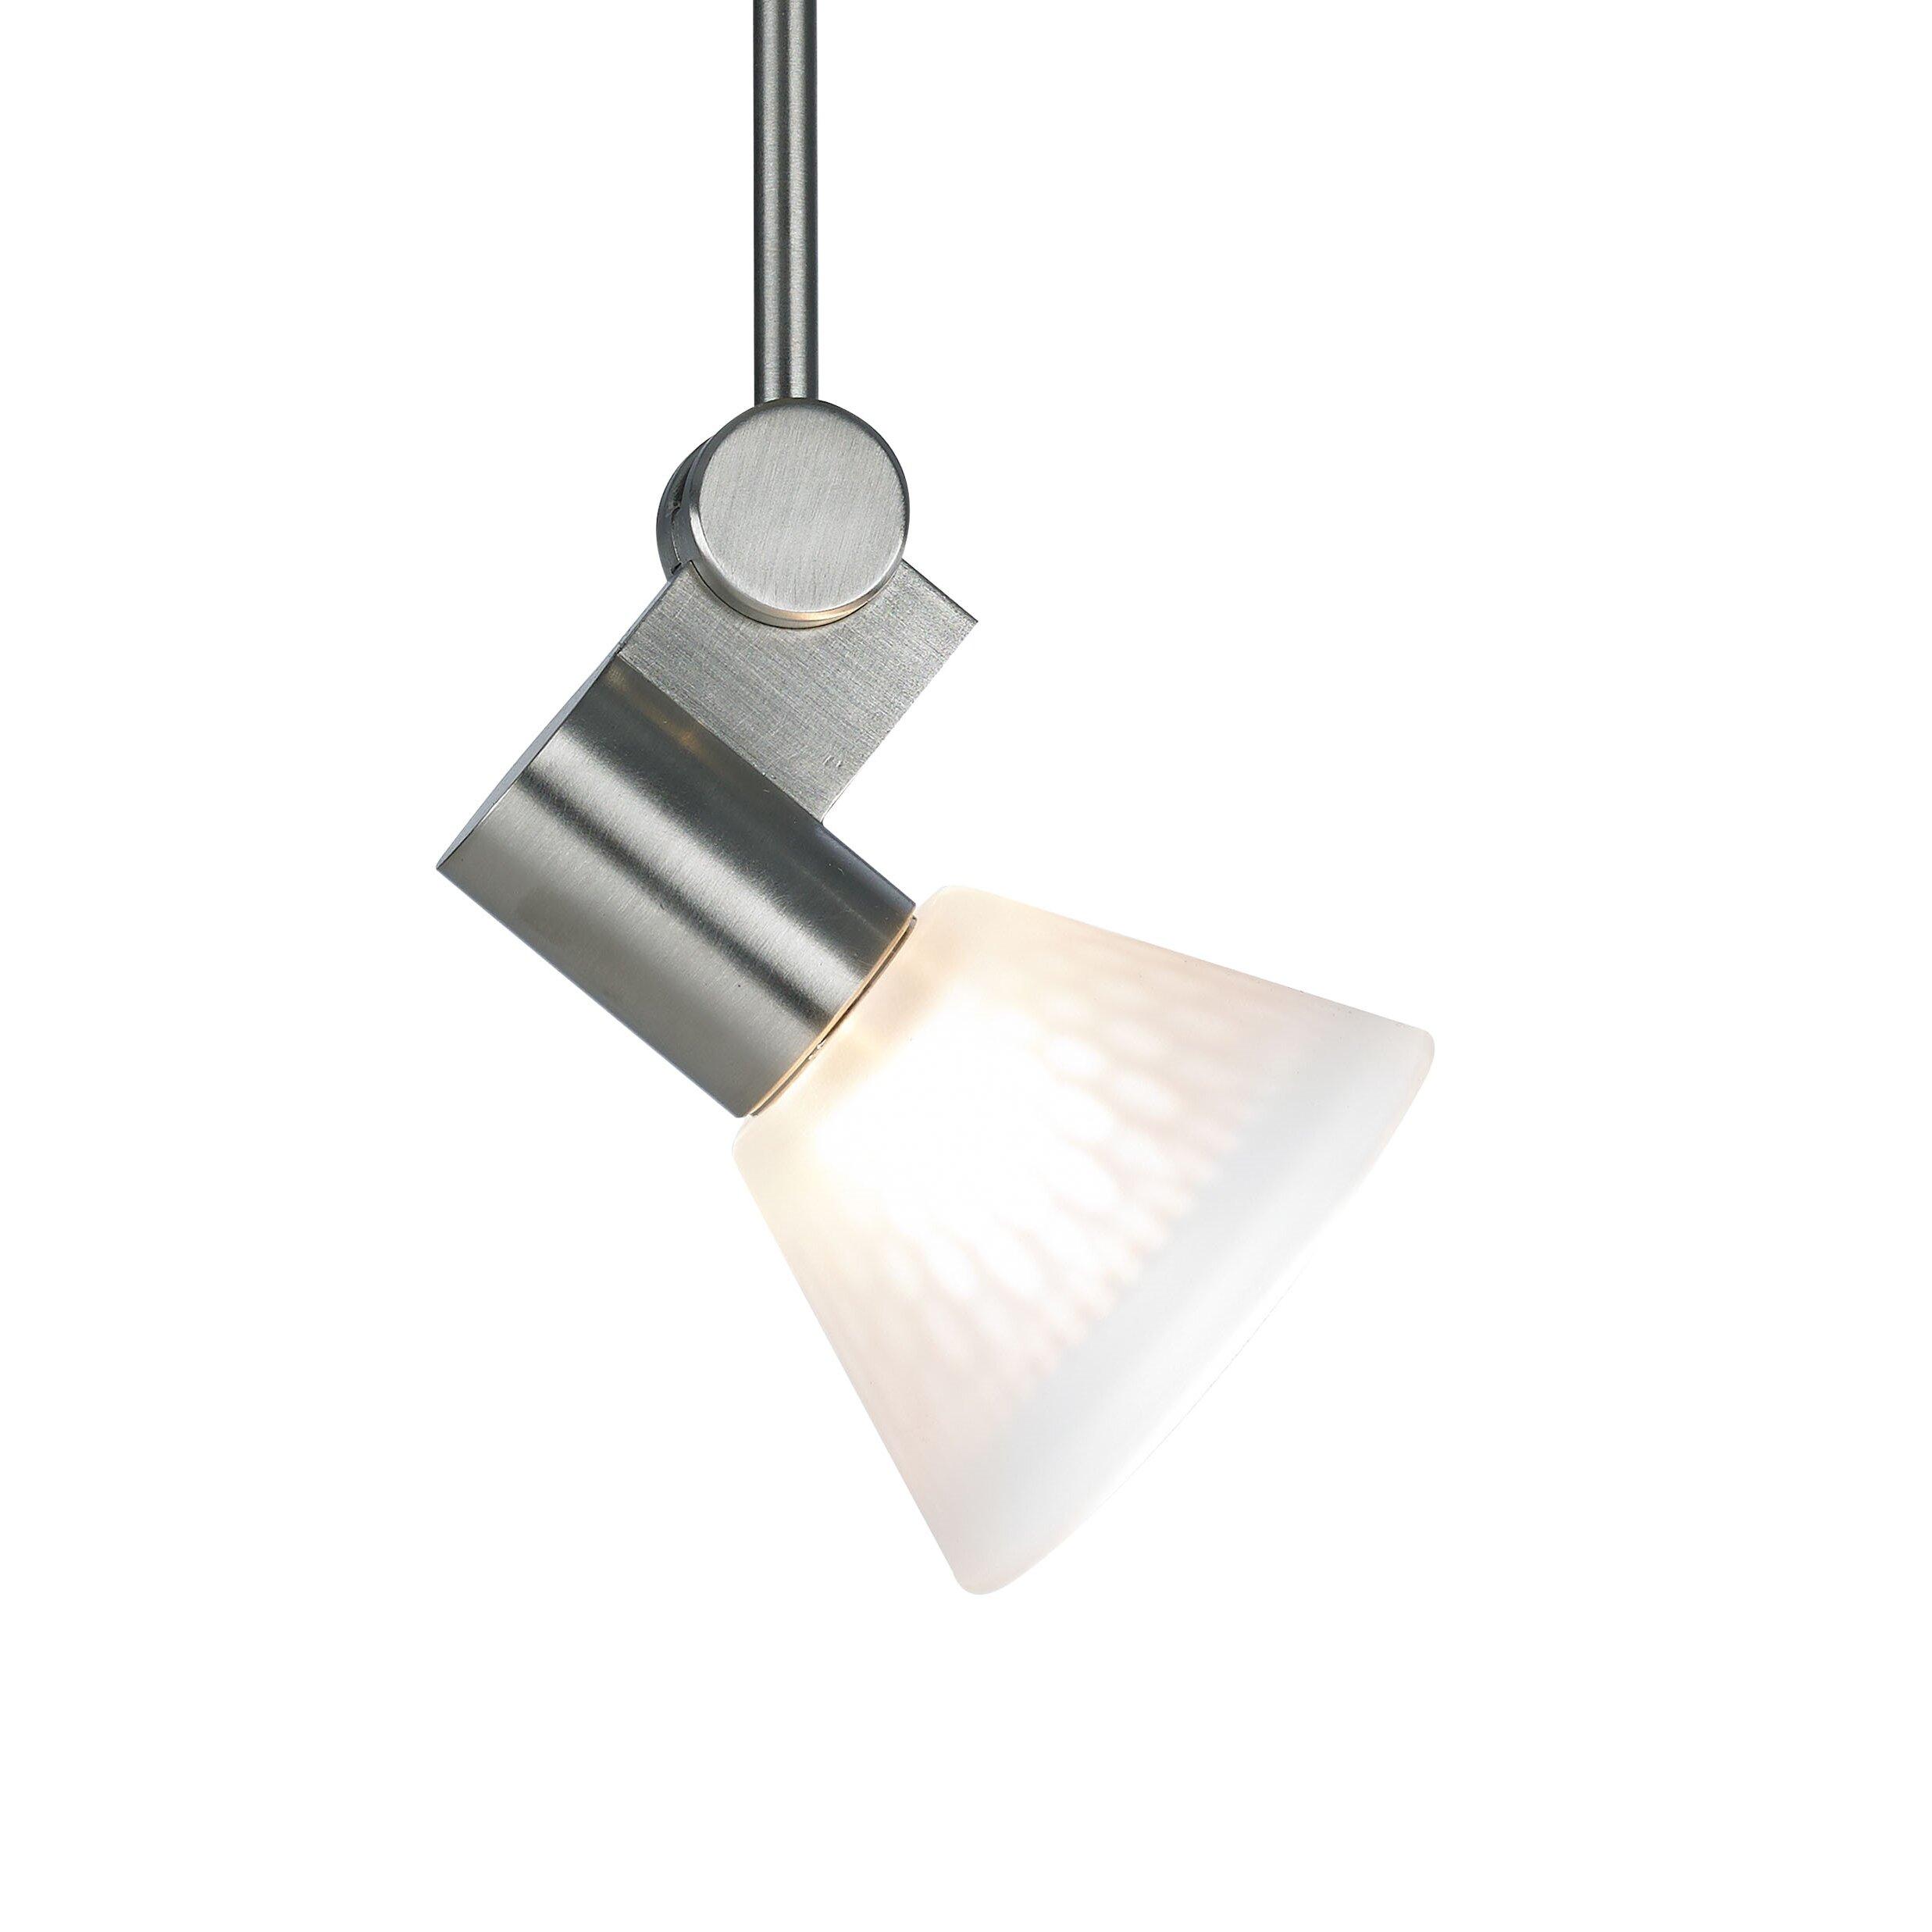 Tech Lighting Roto 1 Light Monopoint Track Head Wayfair